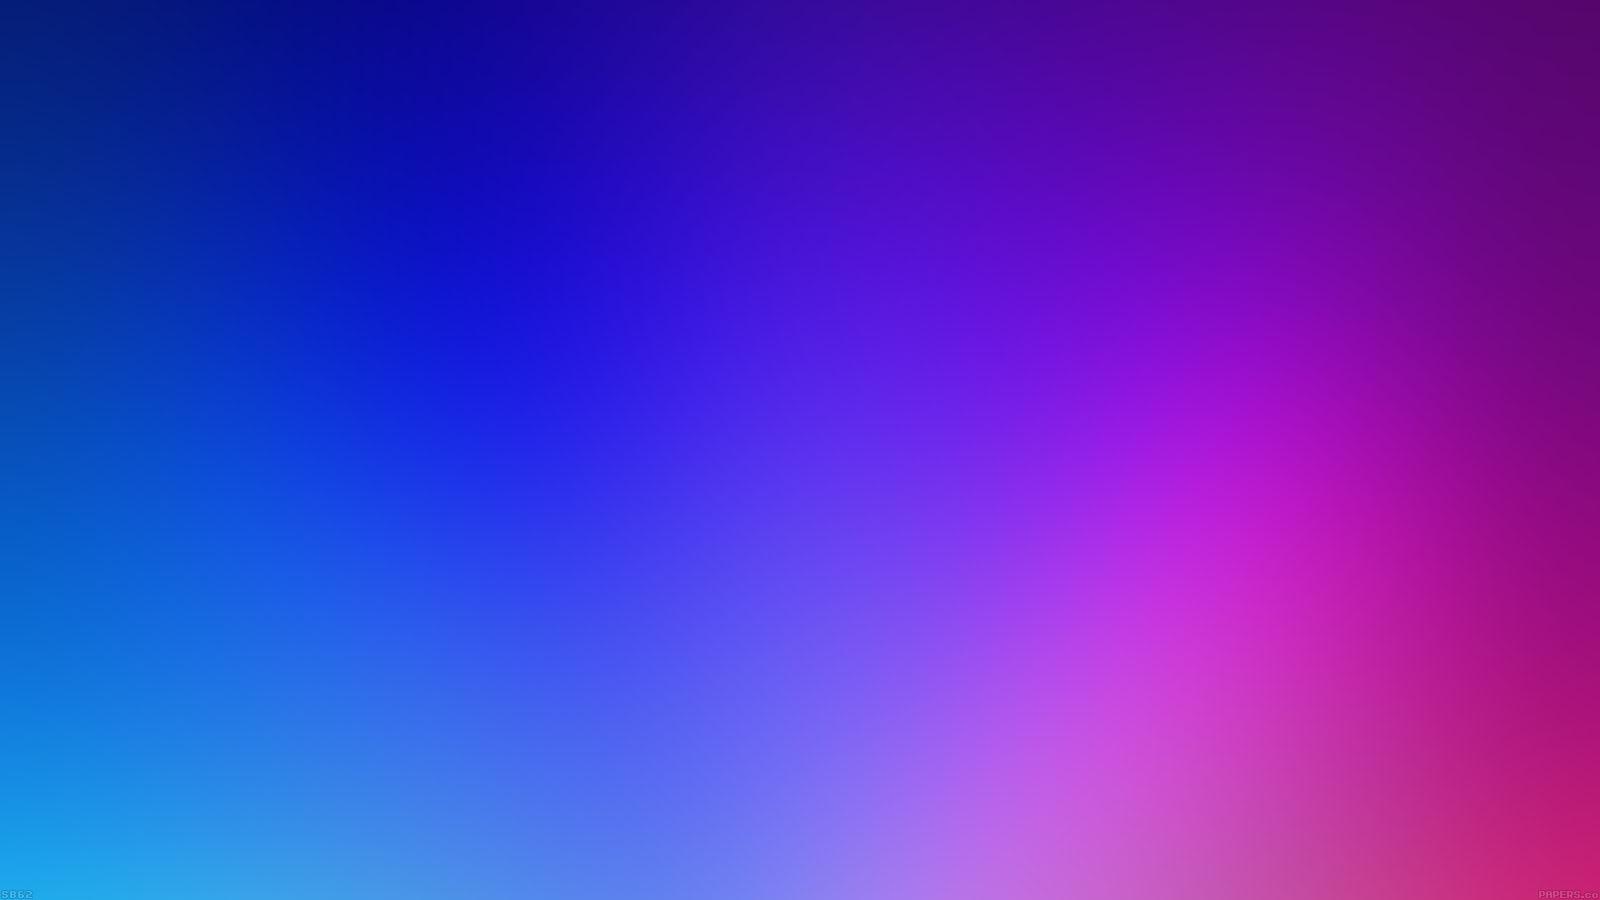 wallpaper for desktop, laptop | sb62-wallpaper-rainbow ...